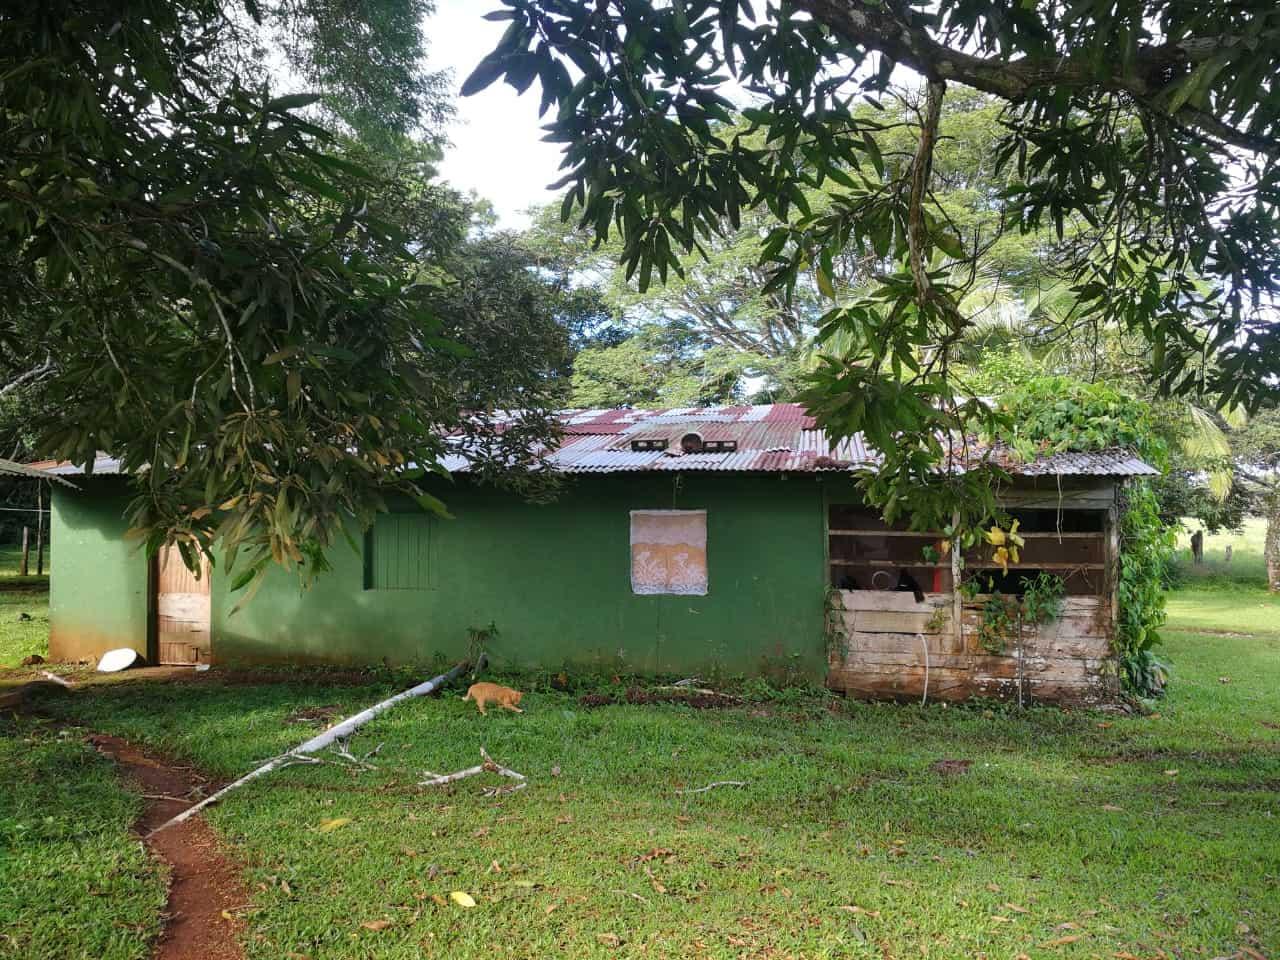 Area de Conservaciòn Guanacaste